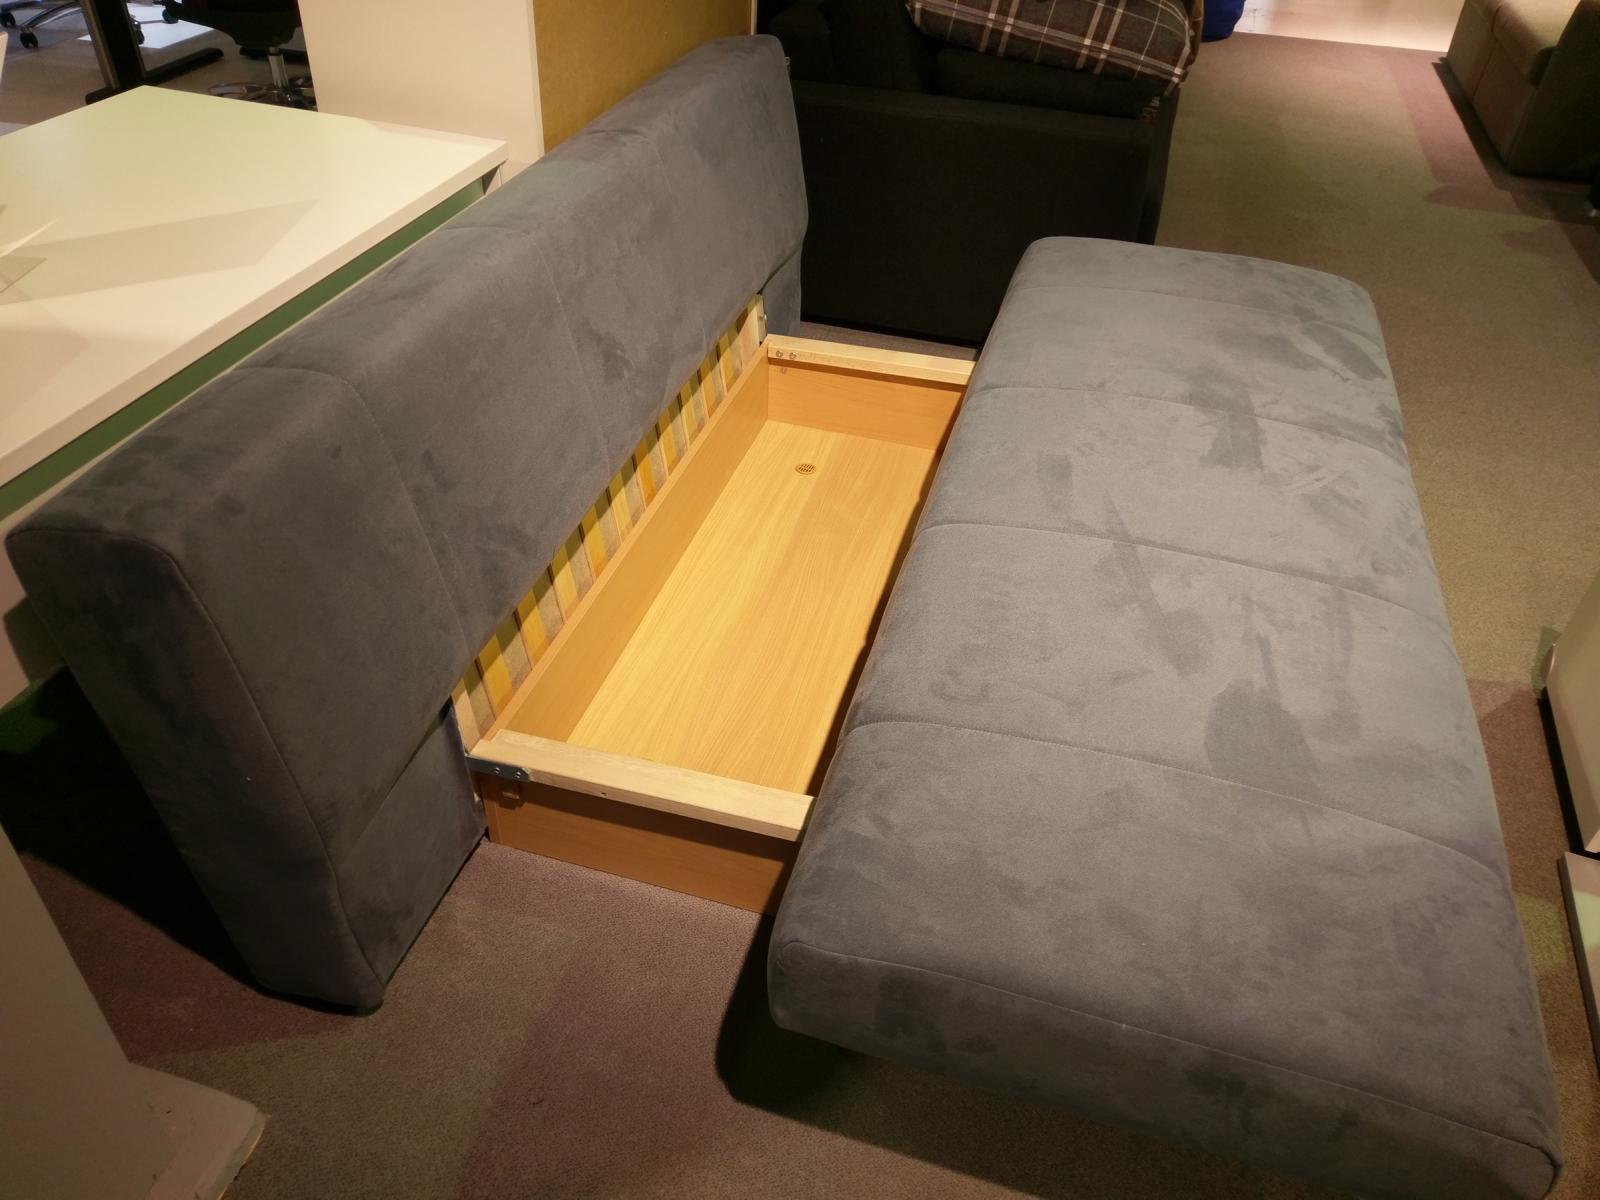 schlafsofa querschl fer andrea von goldammer super preis ebay. Black Bedroom Furniture Sets. Home Design Ideas